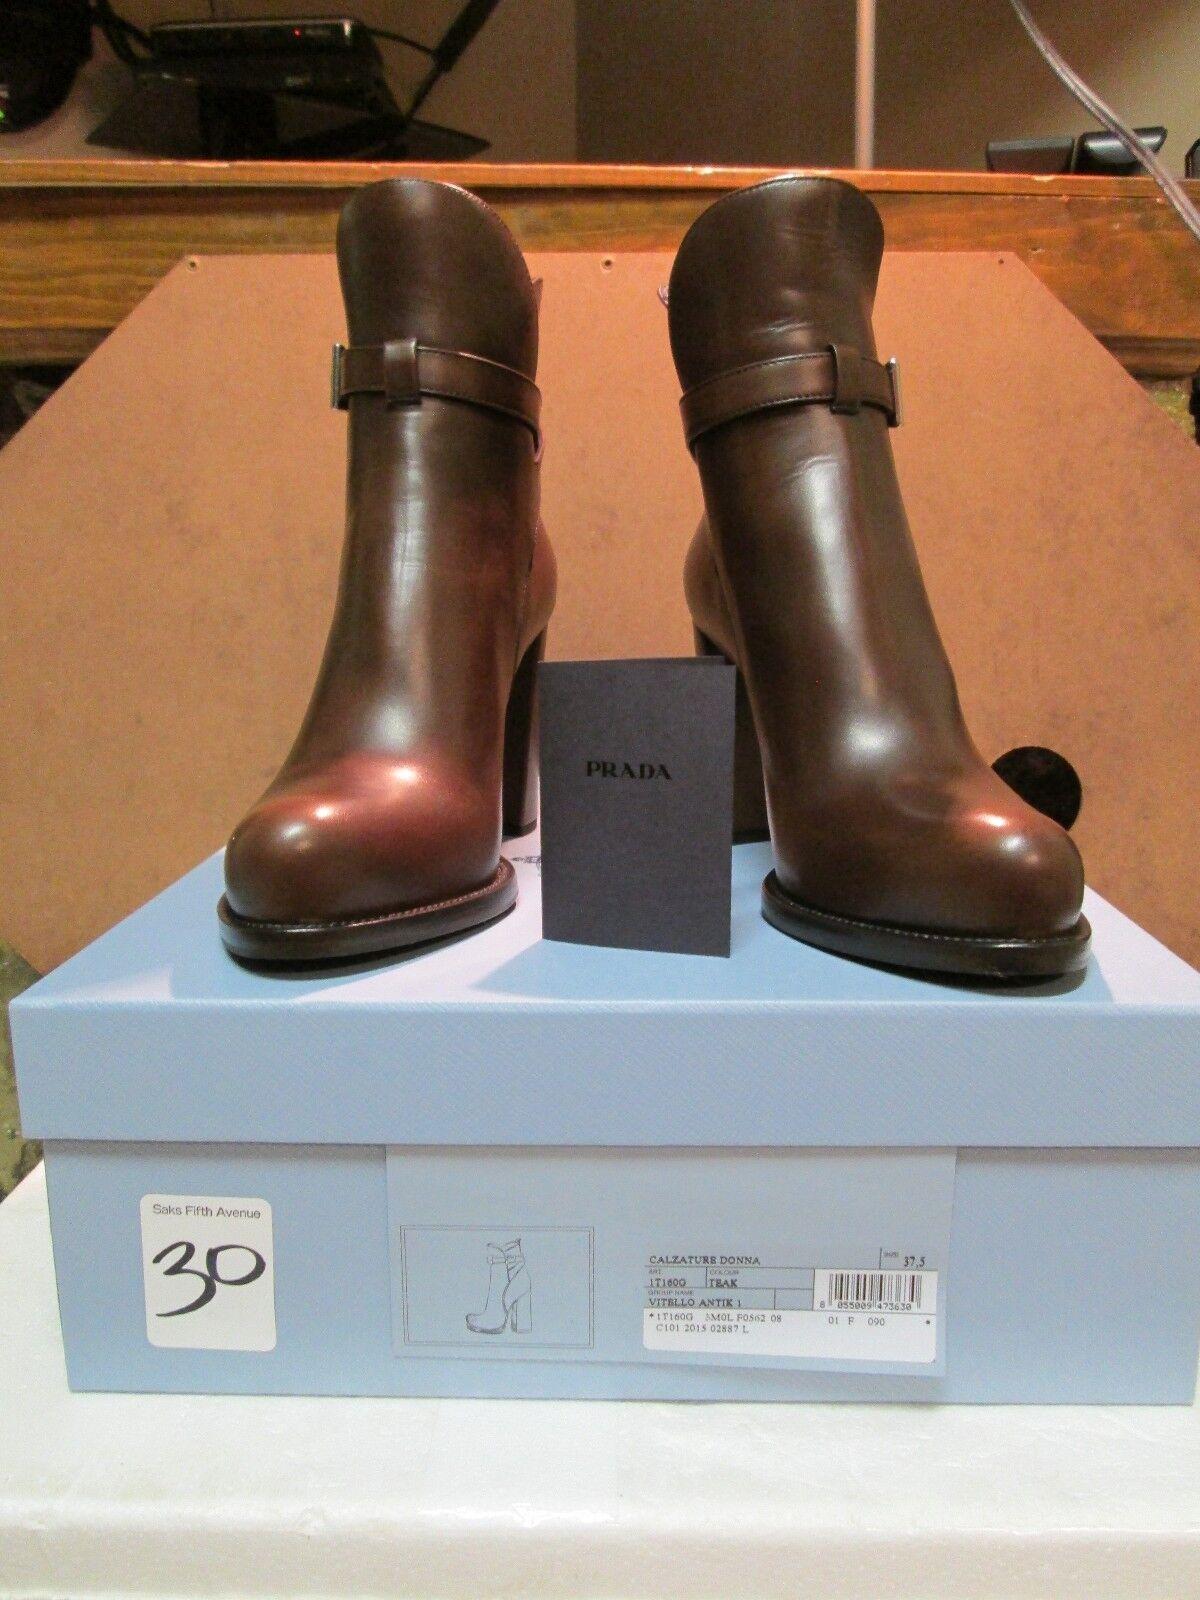 Prada Teak Brown Leather Heeled Booties Size 37.5 NIB  1100